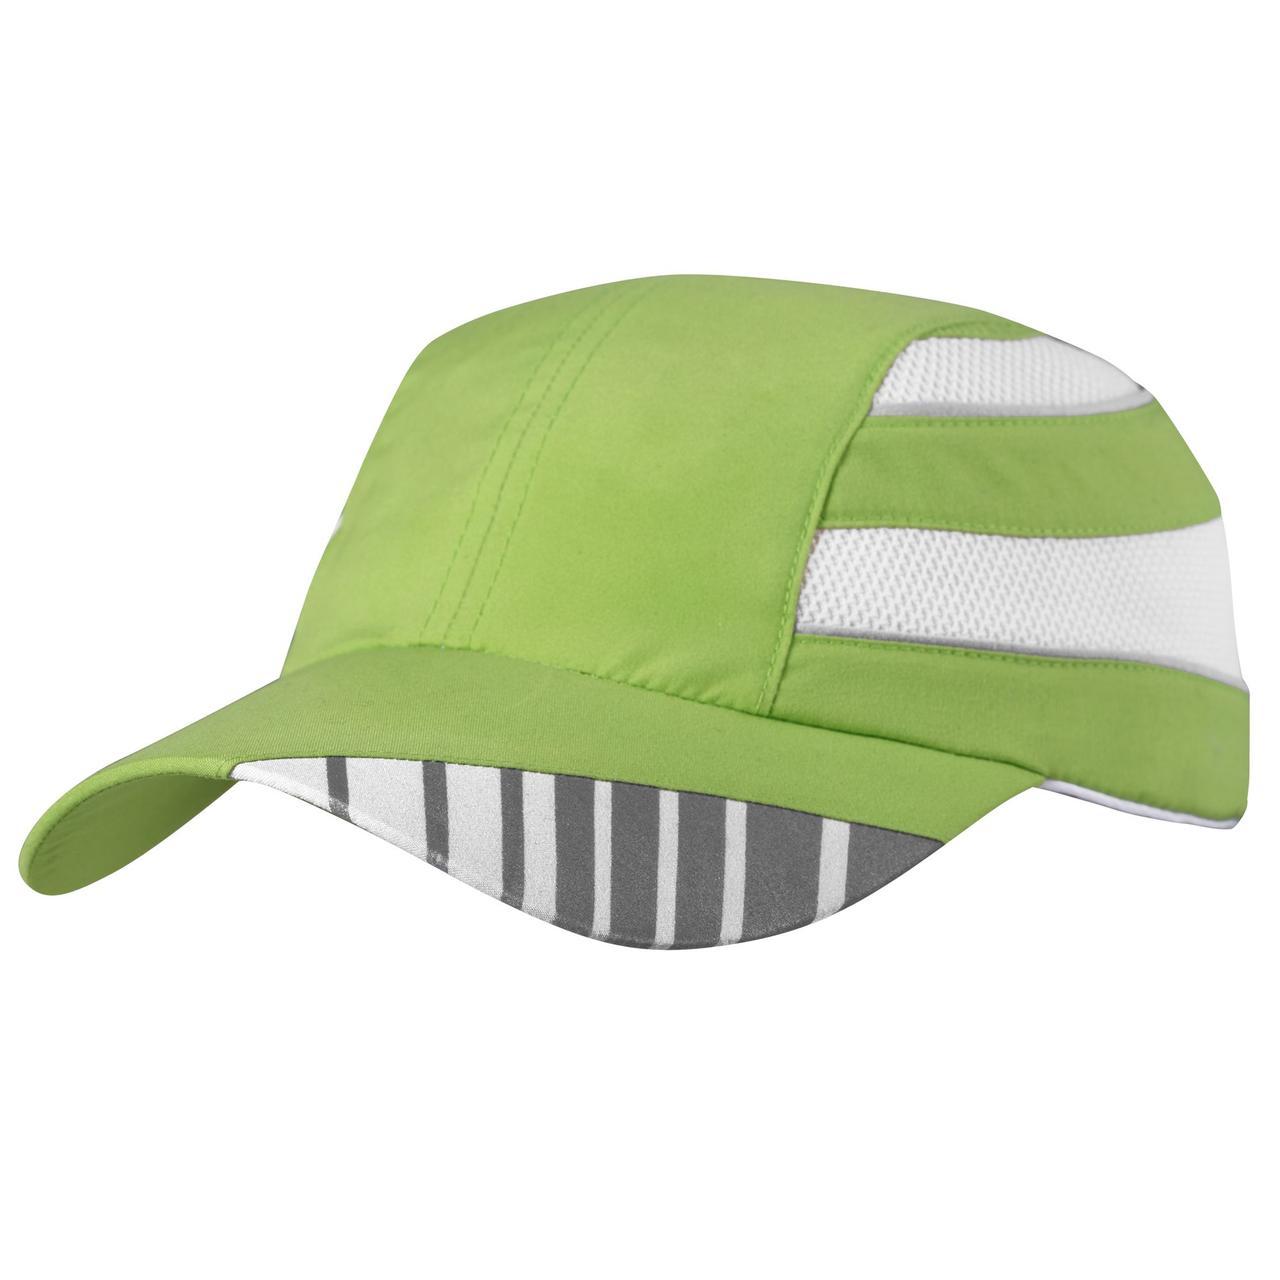 Бейсболка Ben Nevis со светоотражающим элементом, зеленое яблоко (артикул 2387.94)